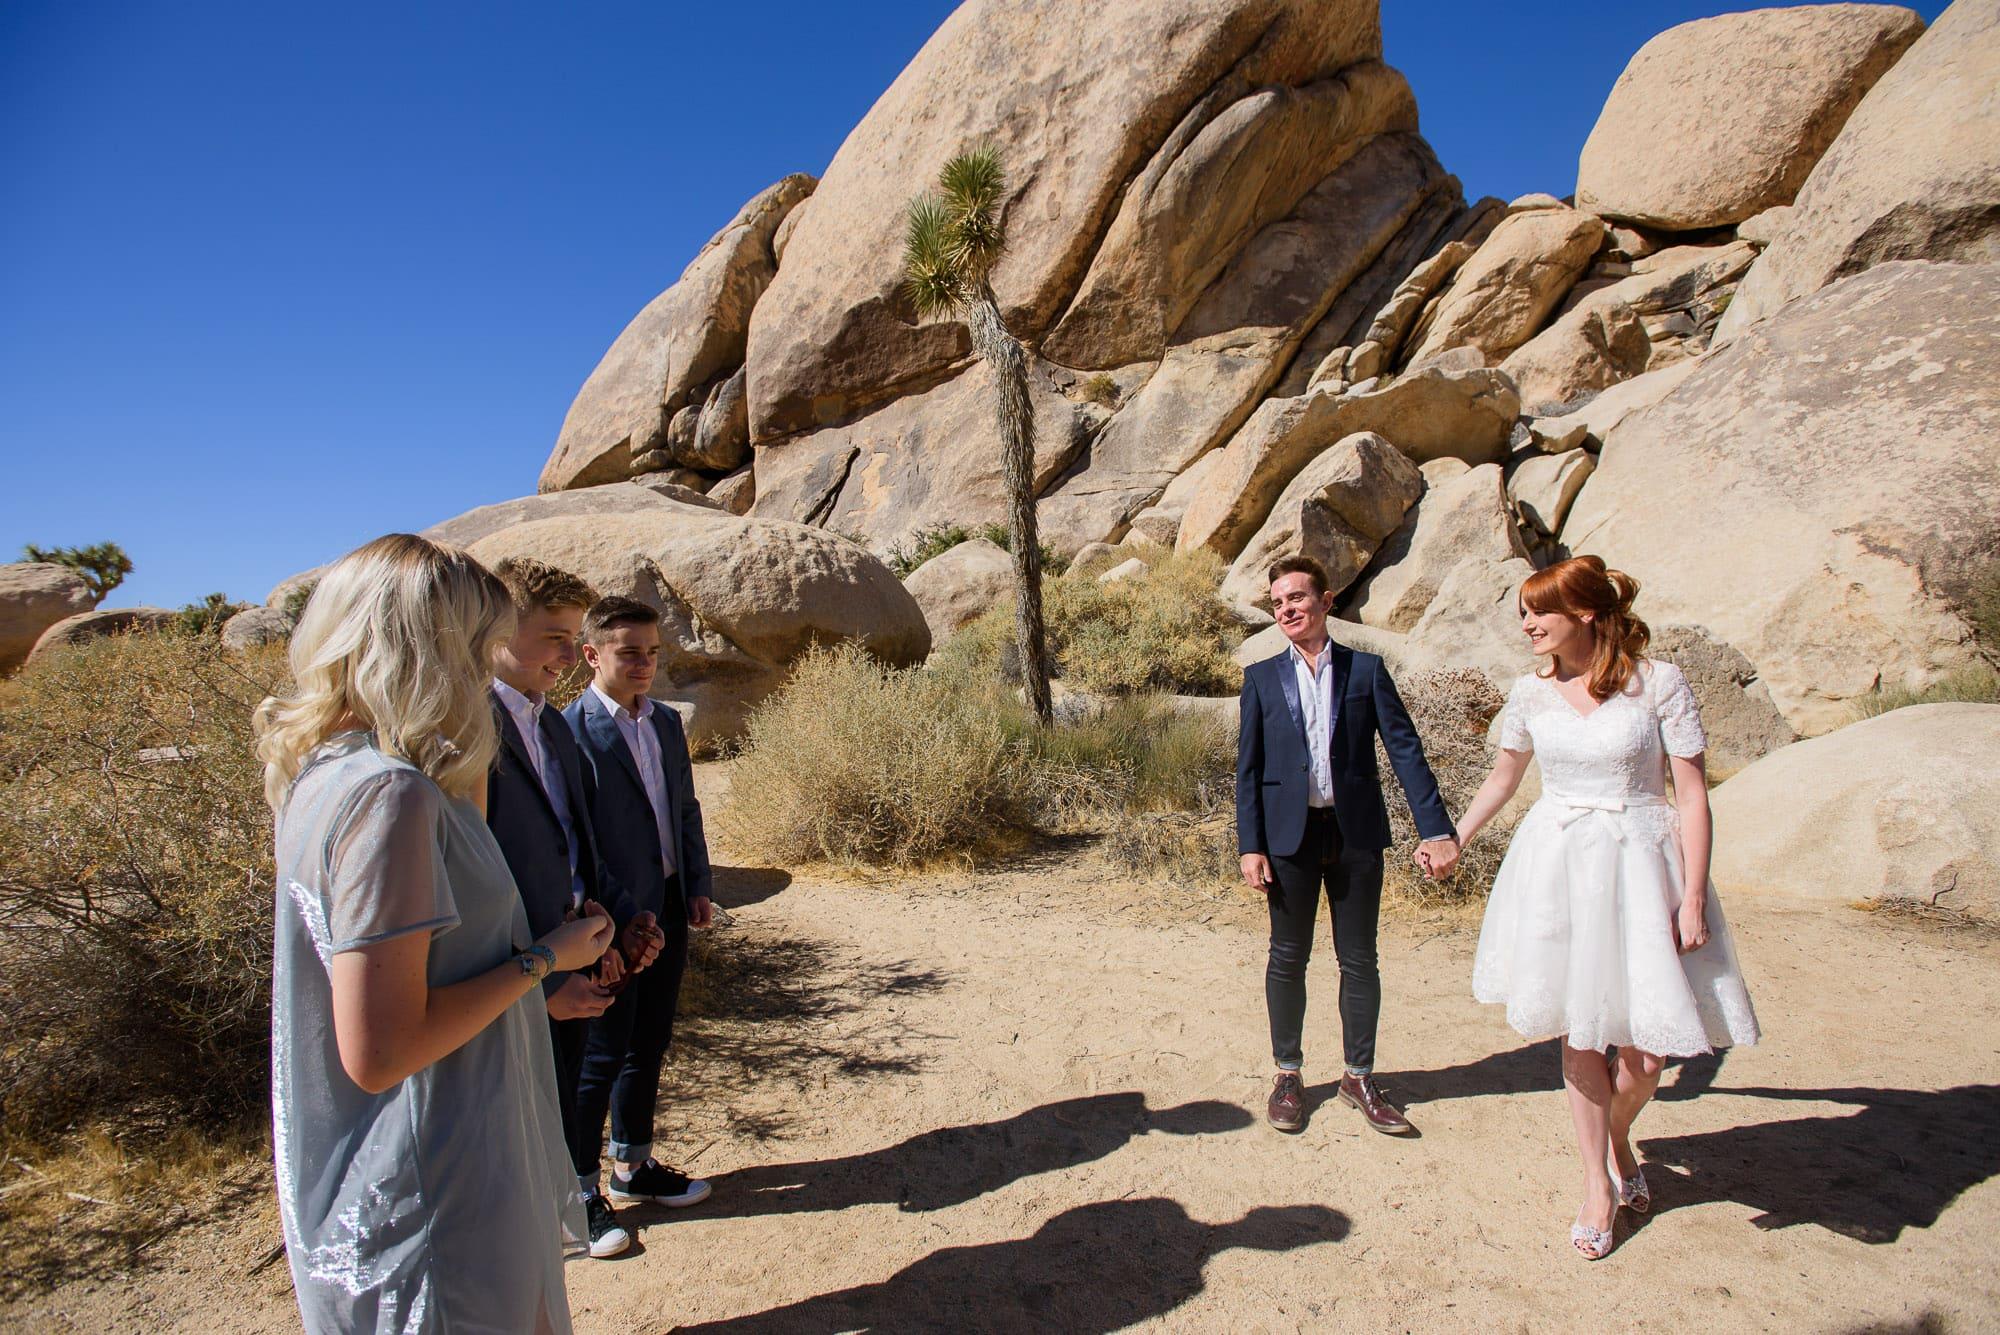 015_Alan_and_Heidi_Joshua_Tree_Destination_Wedding